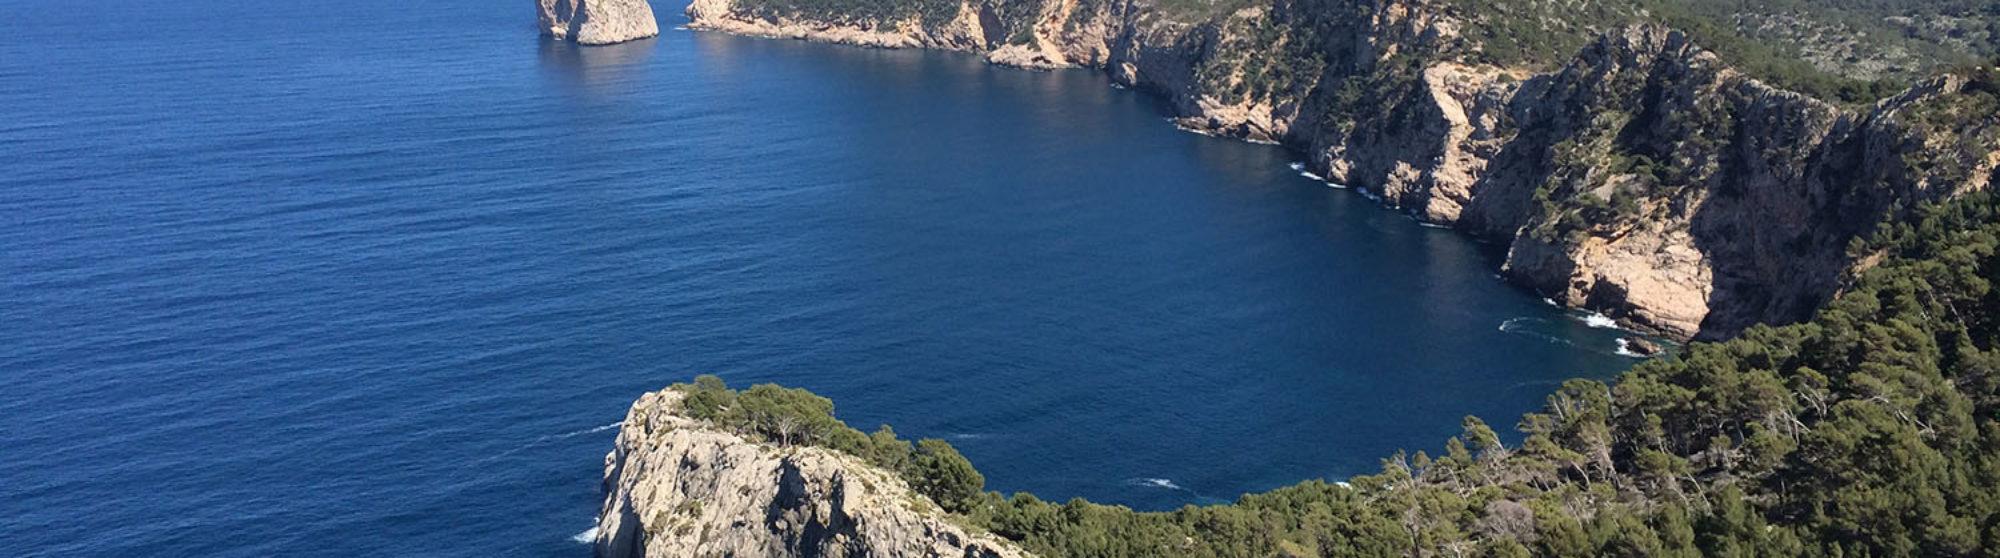 Buggy Tours Mallorca